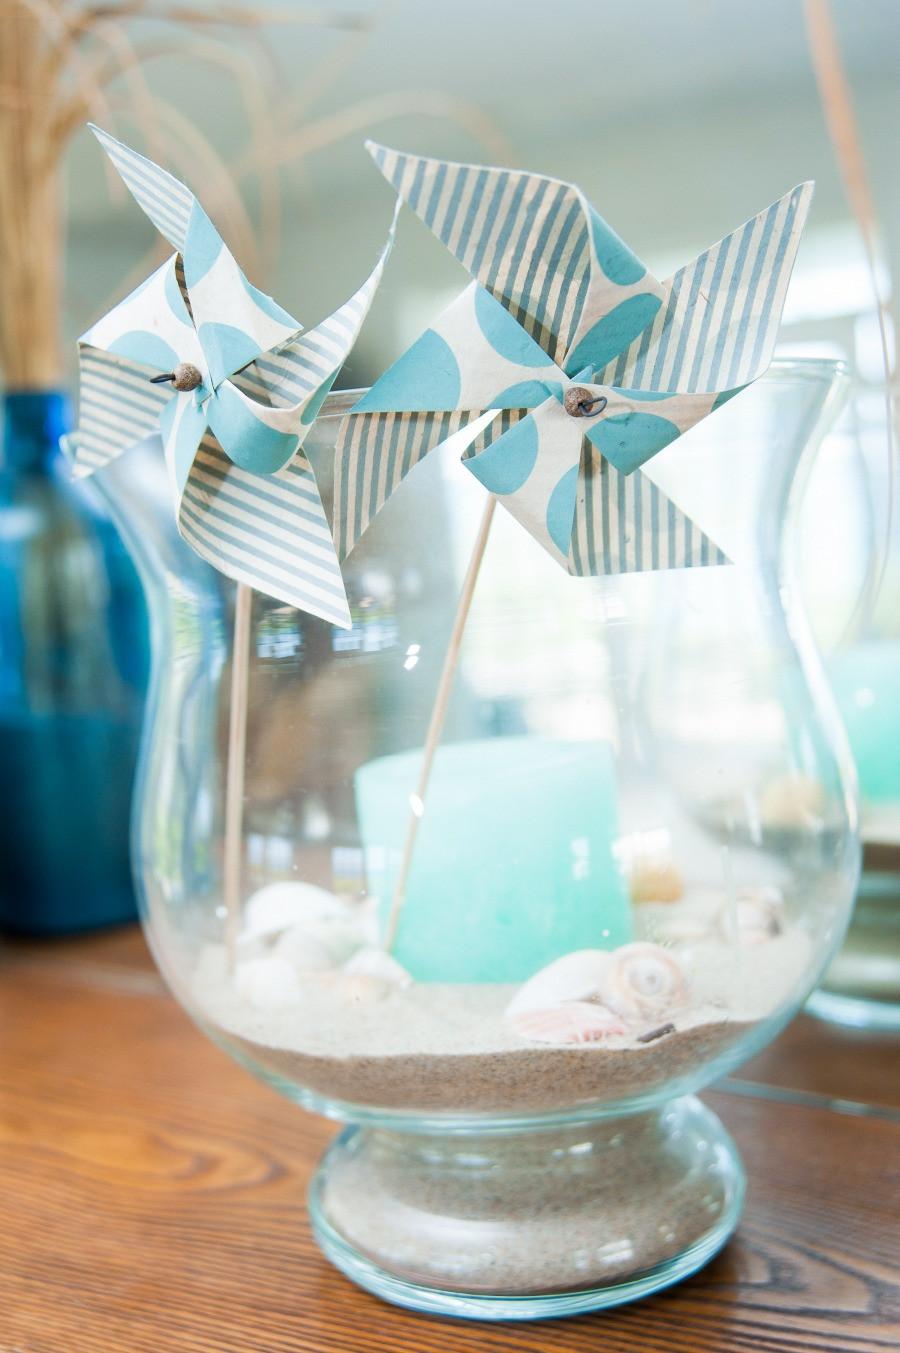 Best ideas about DIY Beach Wedding Ideas . Save or Pin DIY Beach Wedding Ideas The SnapKnot Blog Now.